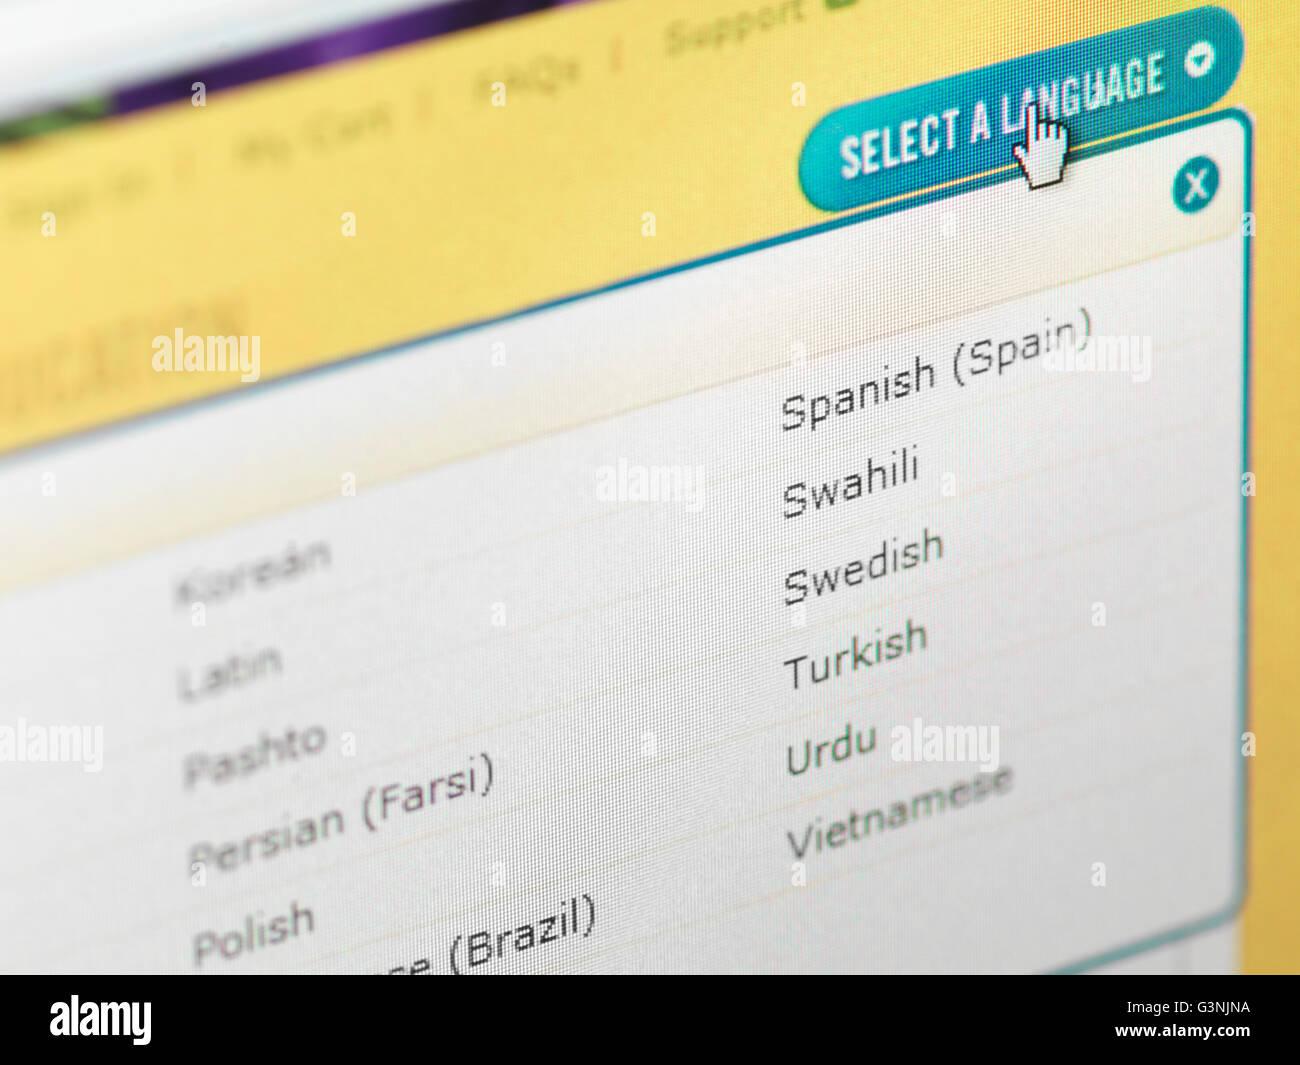 Web site localization menu, language selection - Stock Image